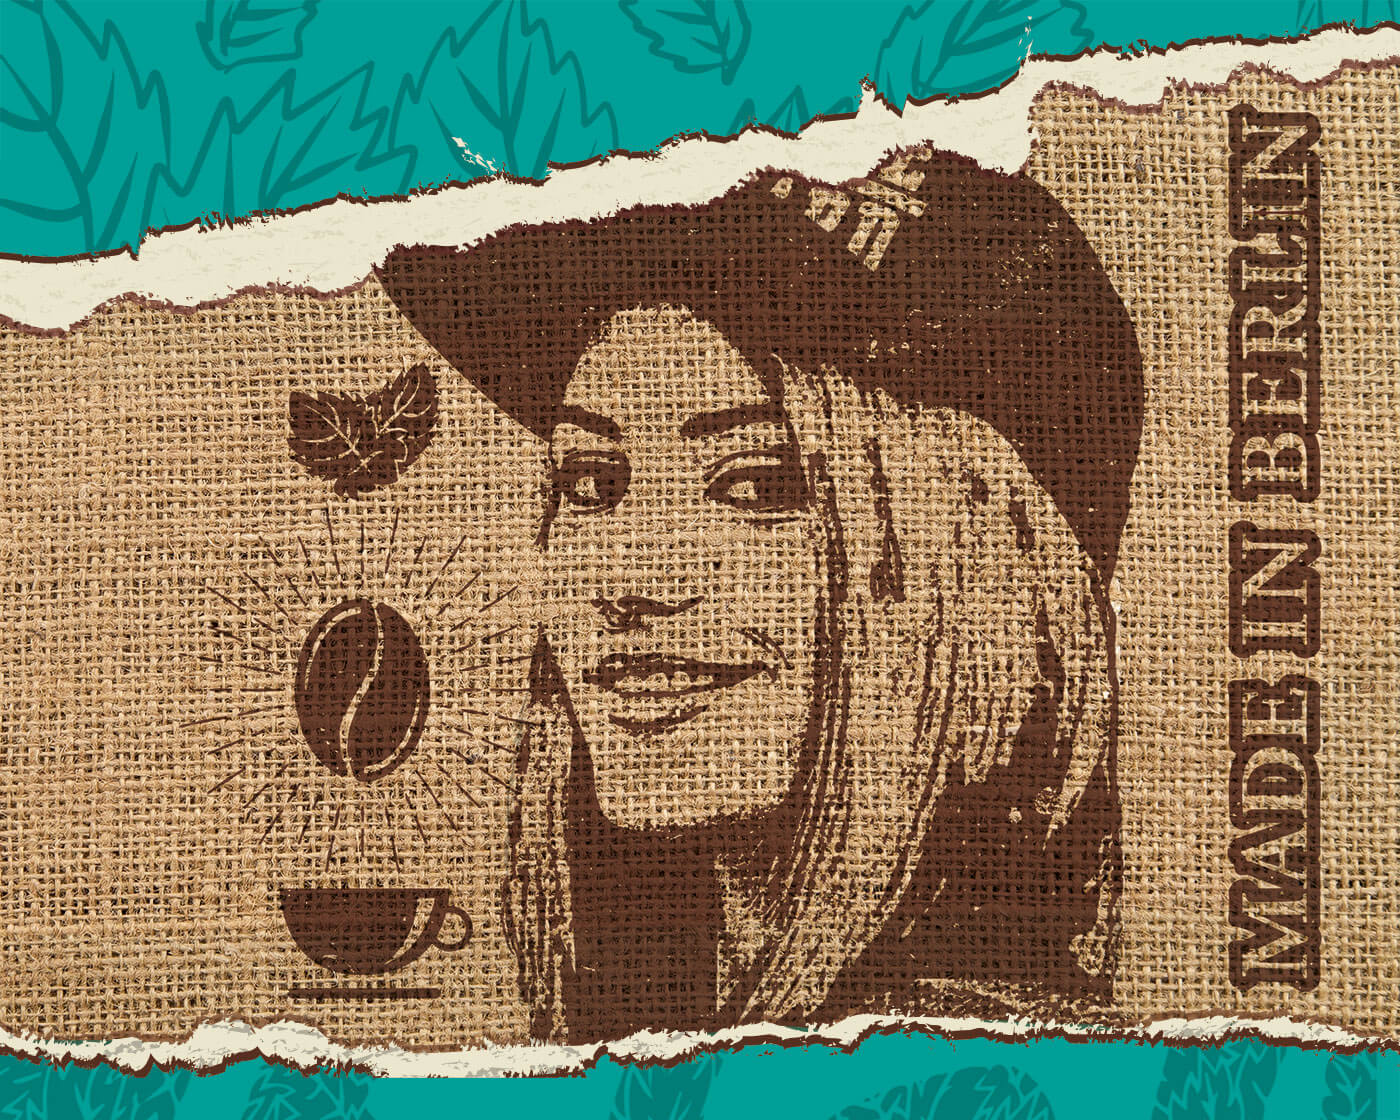 Berliner Luft Kalter Kaffee l Emily